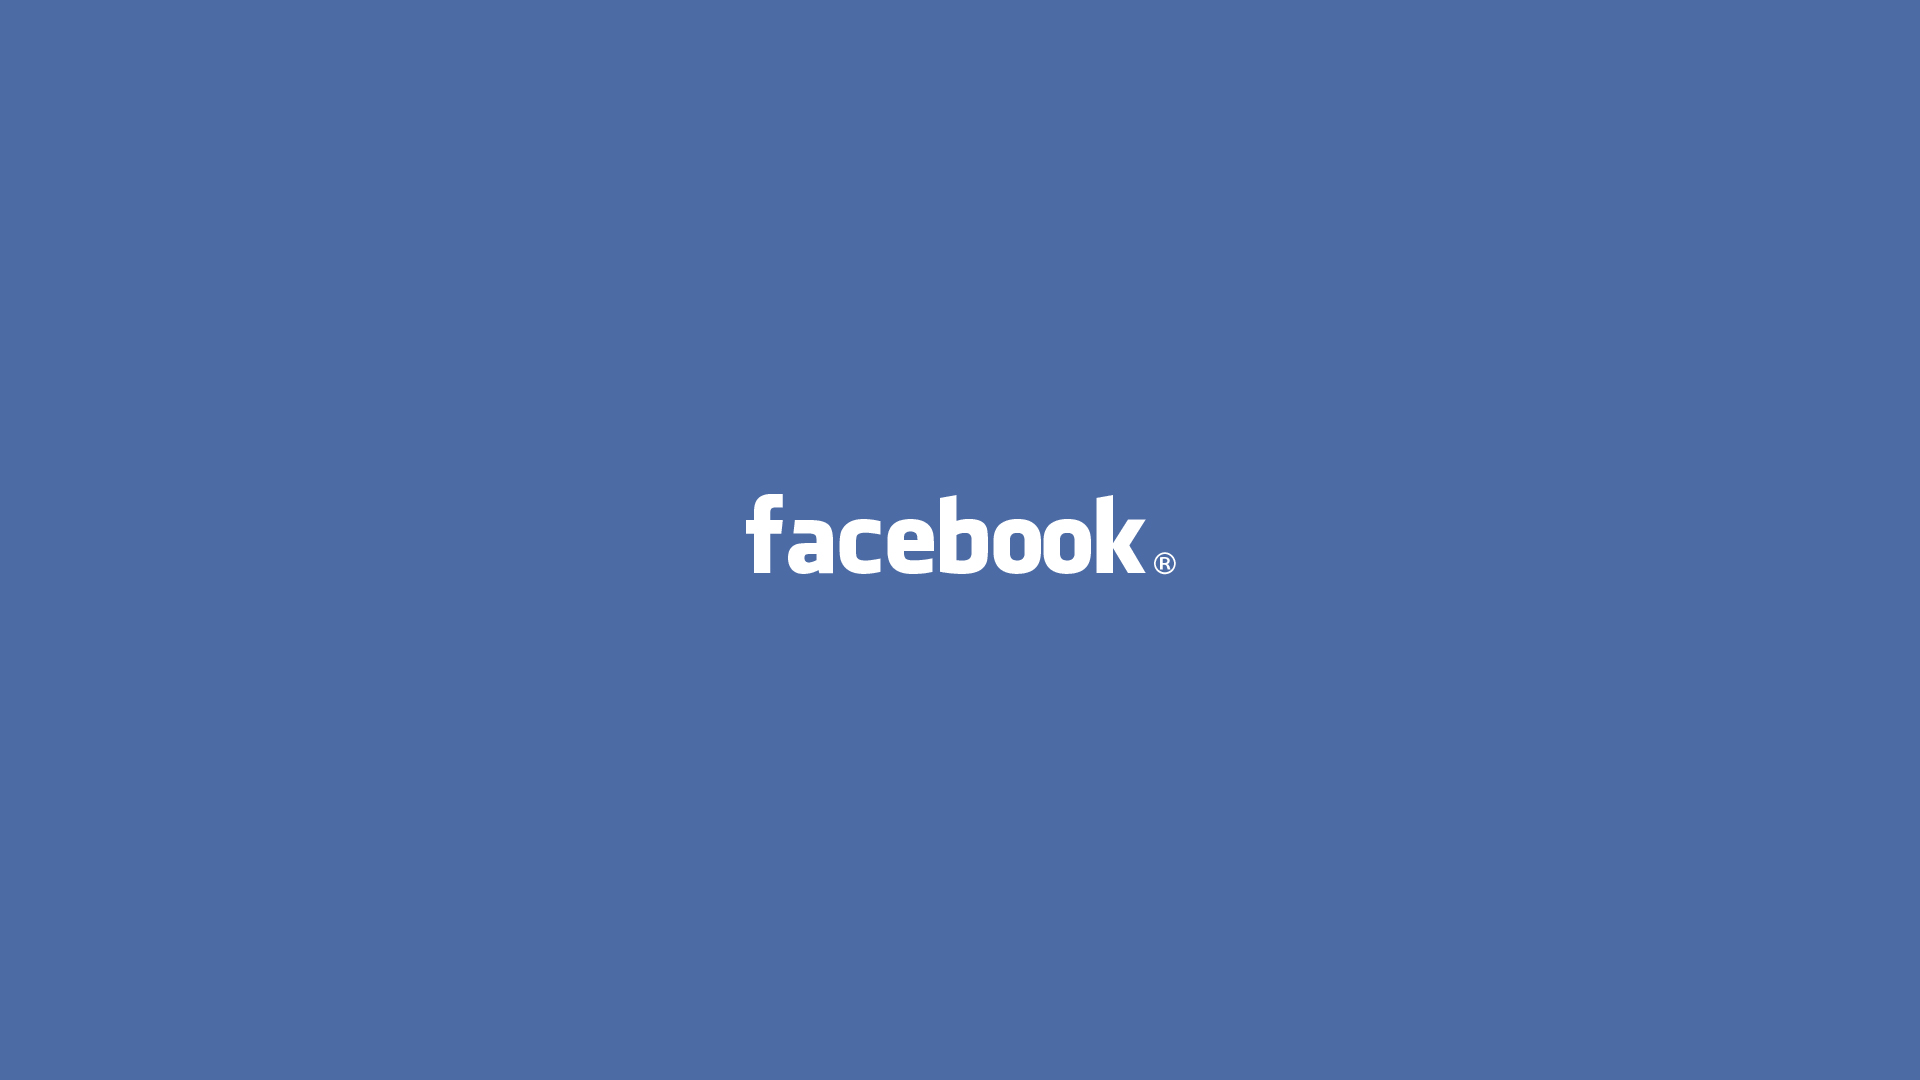 facebook logo desktop wallpaper 62723